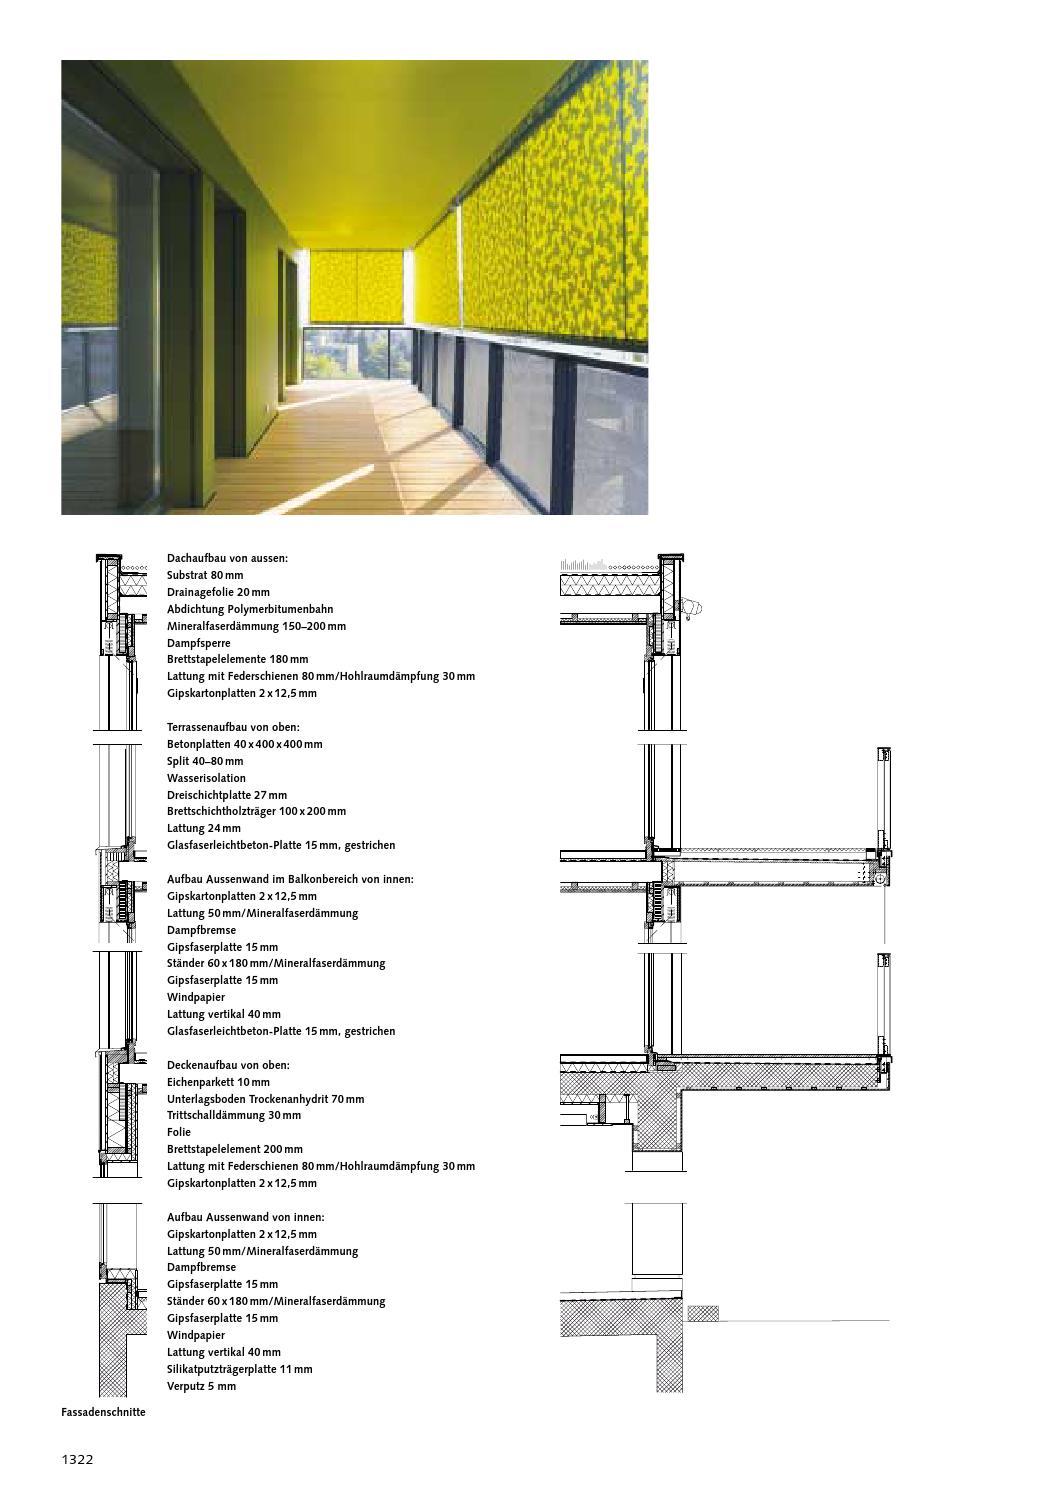 holzbulletin 73/2004 by lignum - issuu